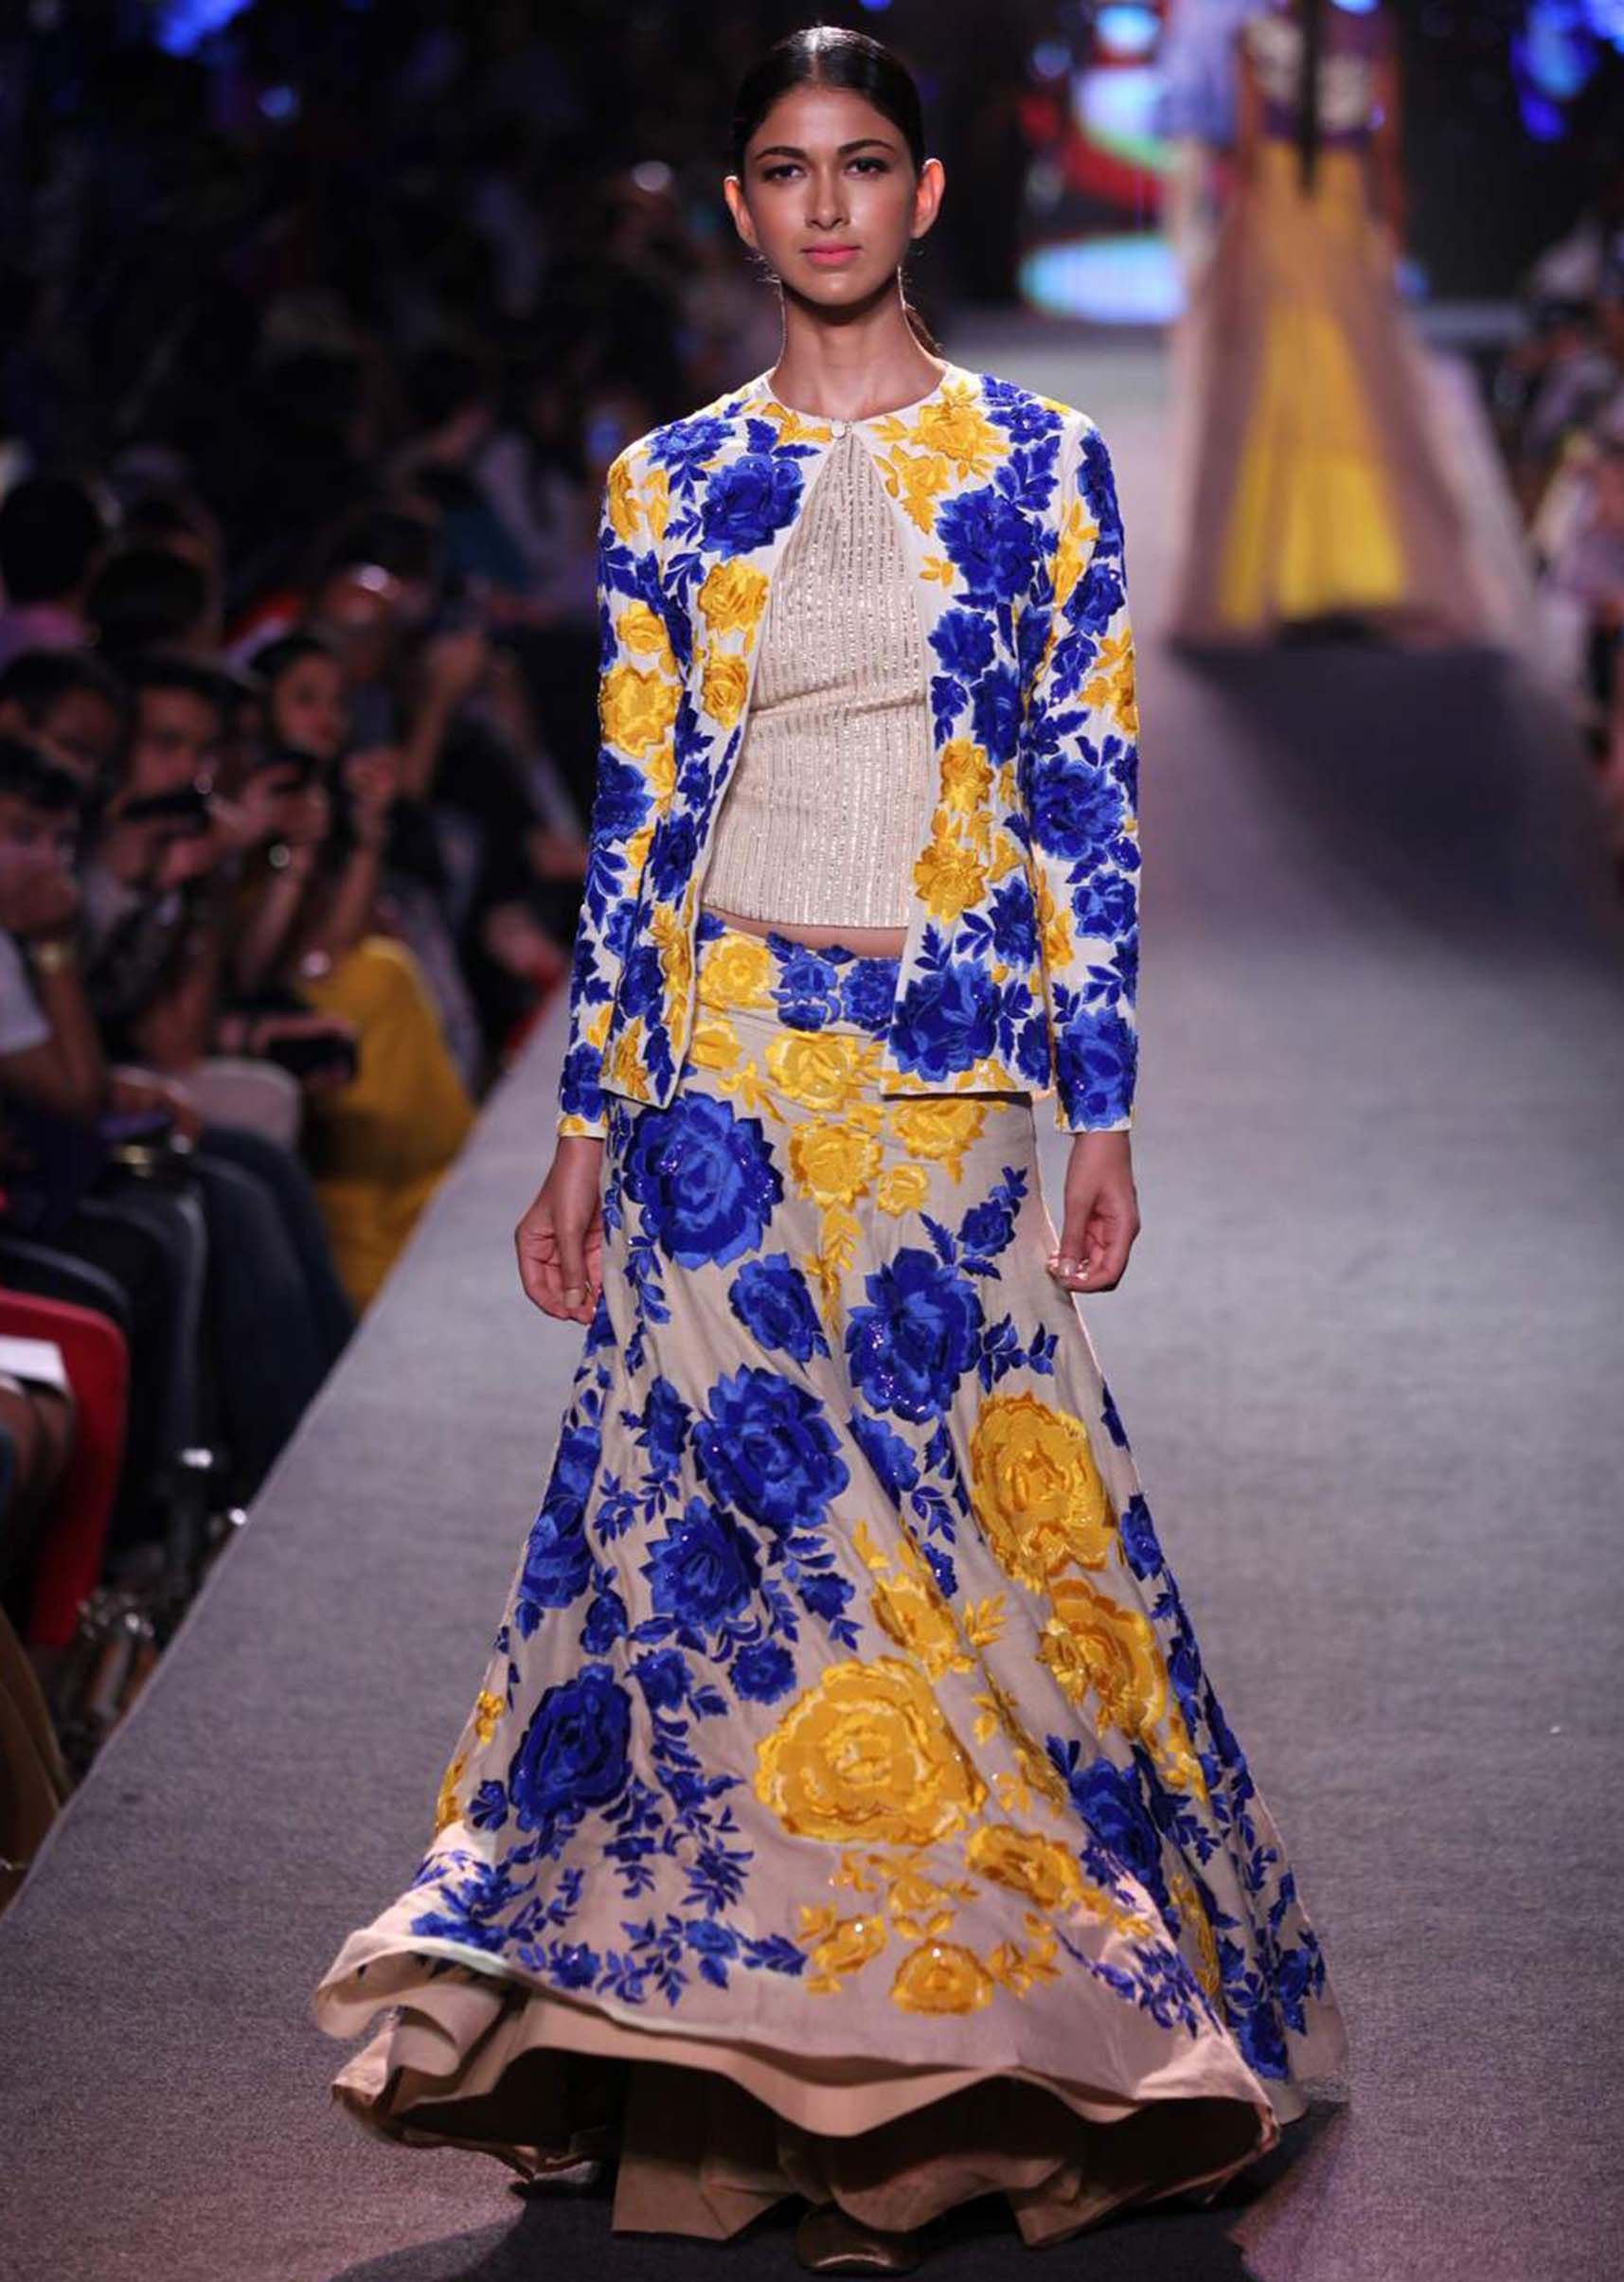 Model walks the ramp in light purple gown adorn in zari embroidery